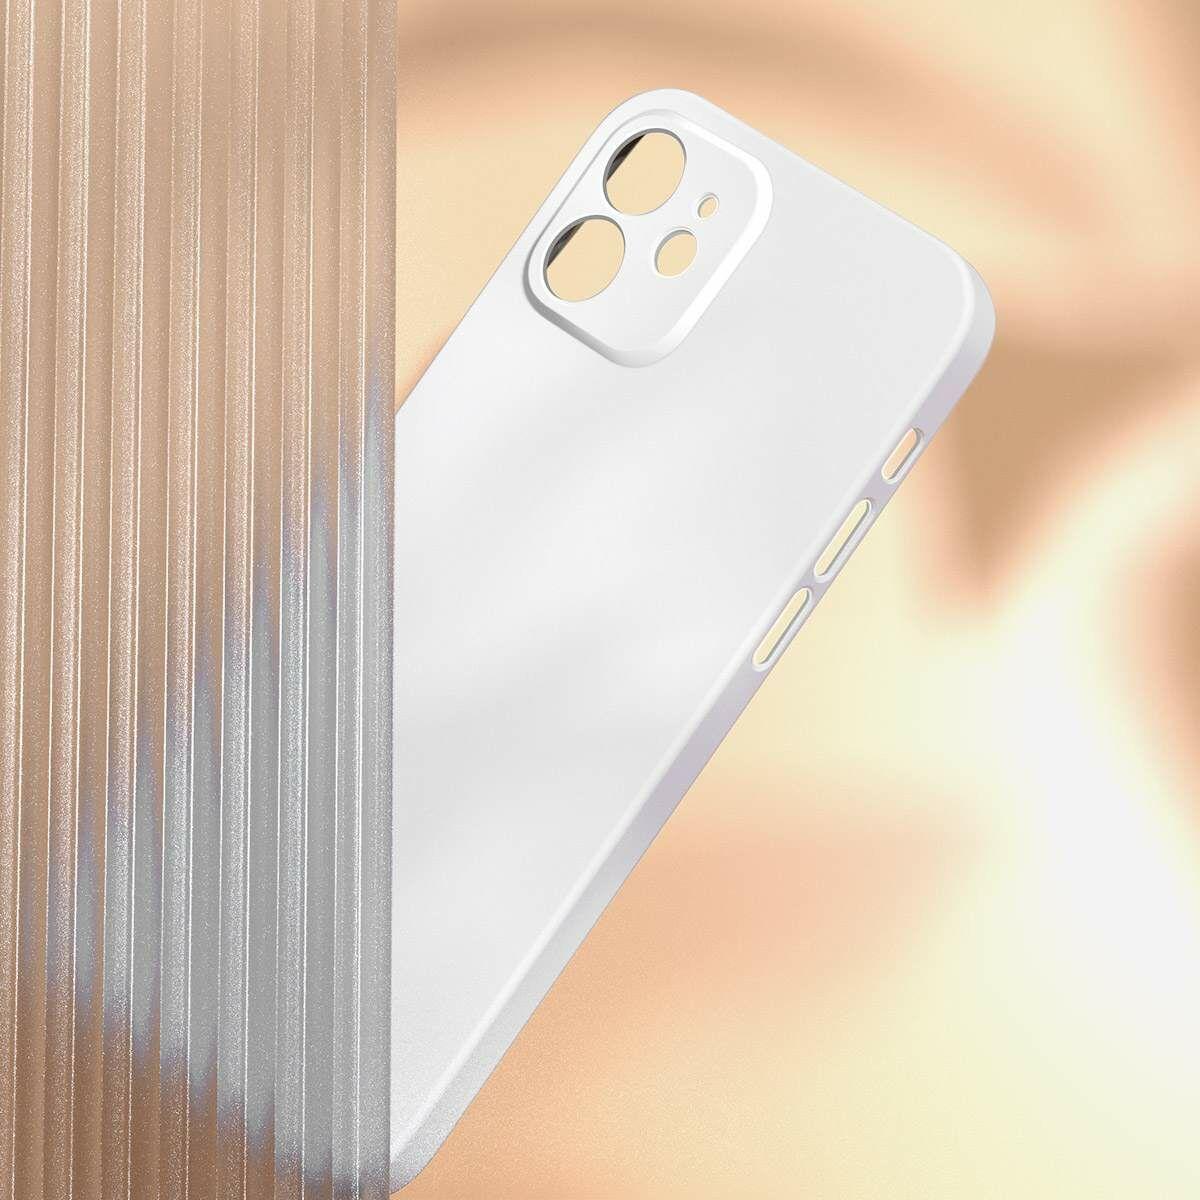 Baseus iPhone 12 mini tok, Liquid Sicila Gel, sötét zöld (WIAPIPH54N-YT6A)